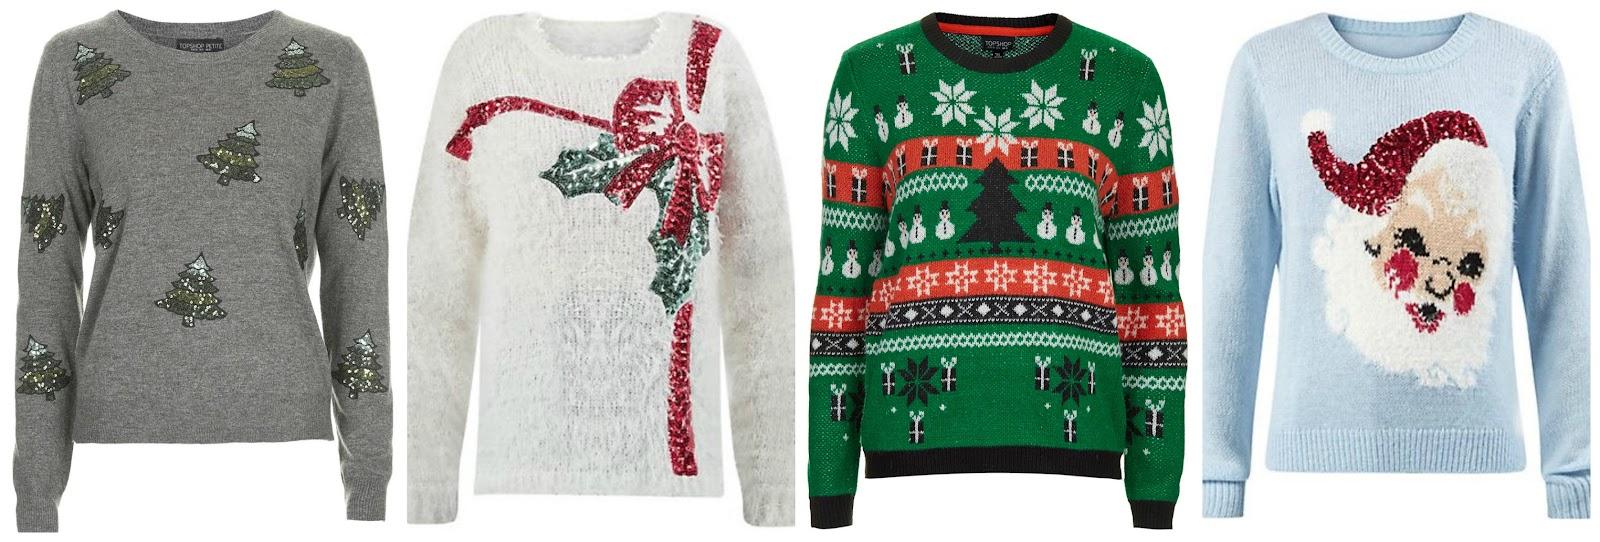 Christmas jumpers wishlist 2014, blogger, Primark, Topshop, Debenhams, New Look